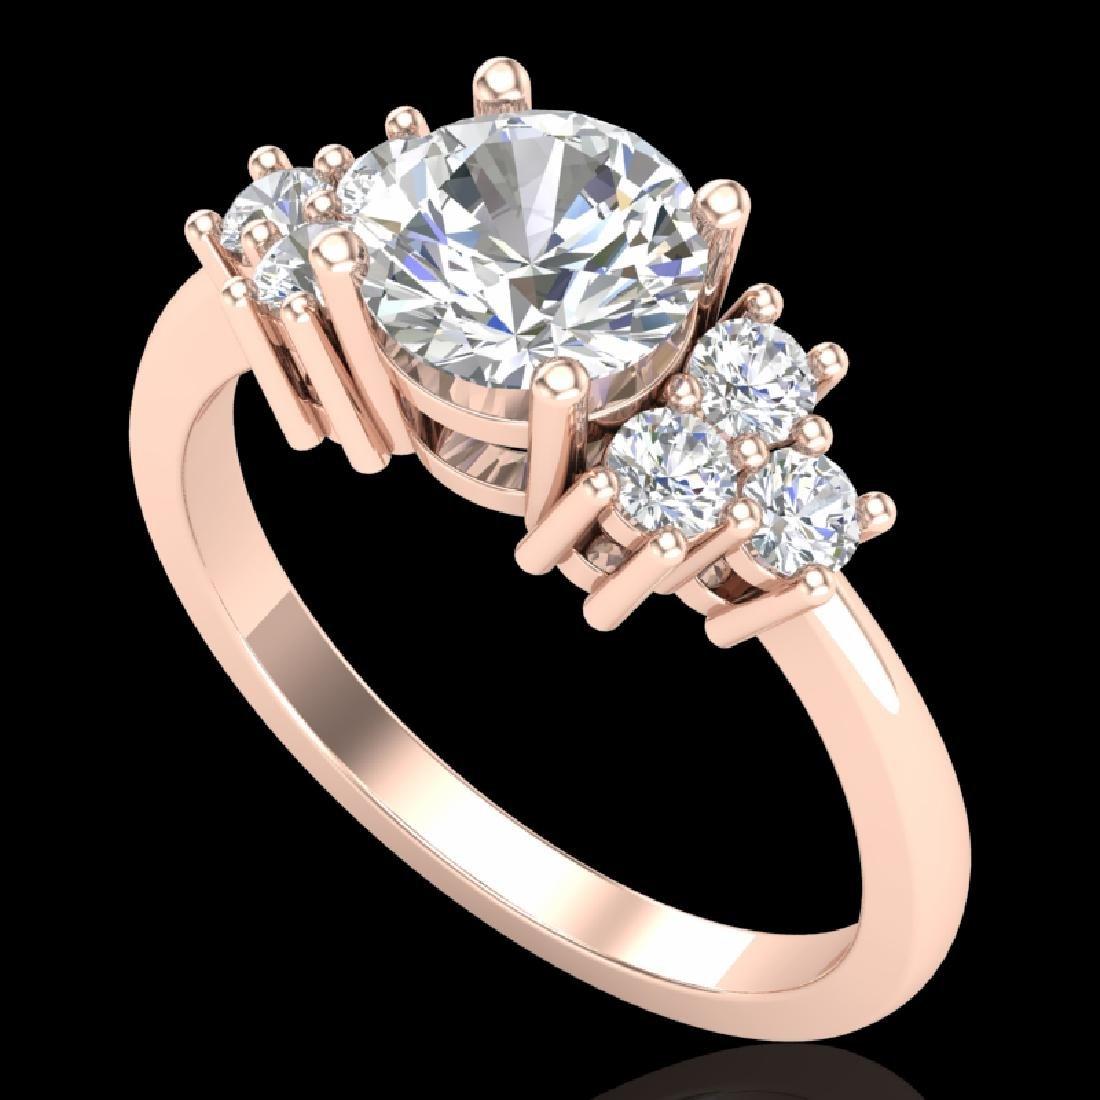 1.5 CTW VS/SI Diamond Solitaire Ring 18K Rose Gold